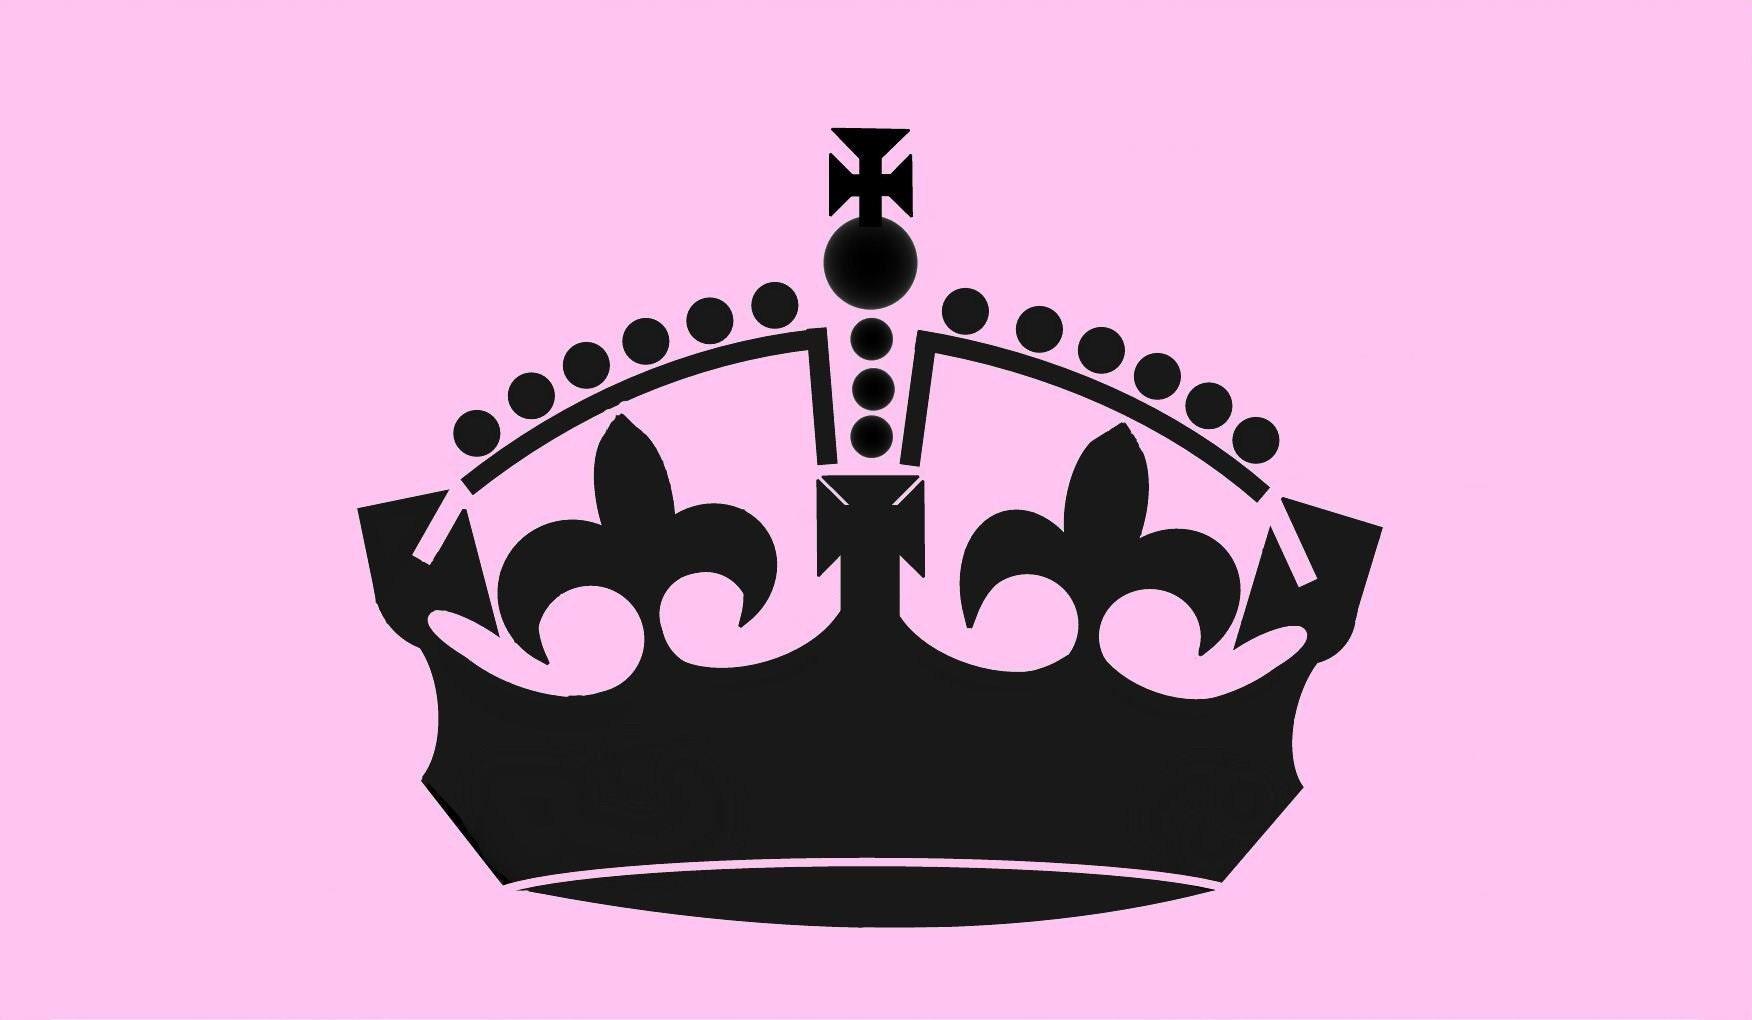 stencil royal crown 8x10 by artisticstencils on etsy. Black Bedroom Furniture Sets. Home Design Ideas